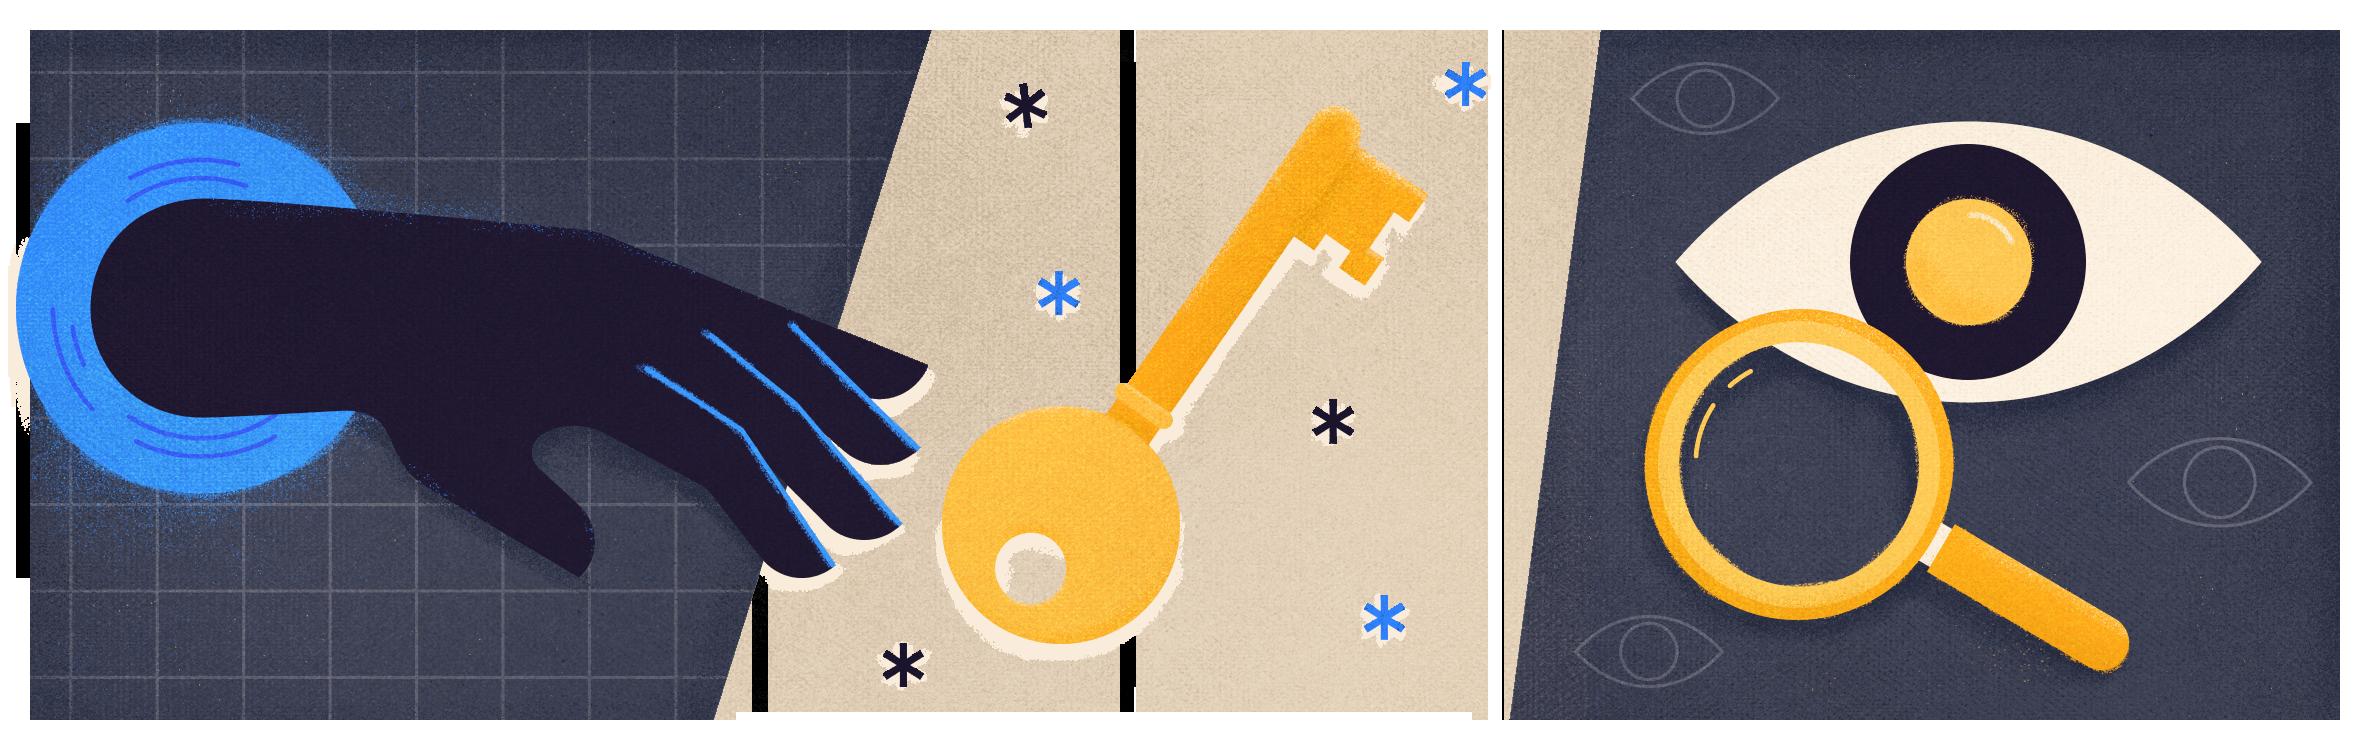 Illustration of data privacy separator 01